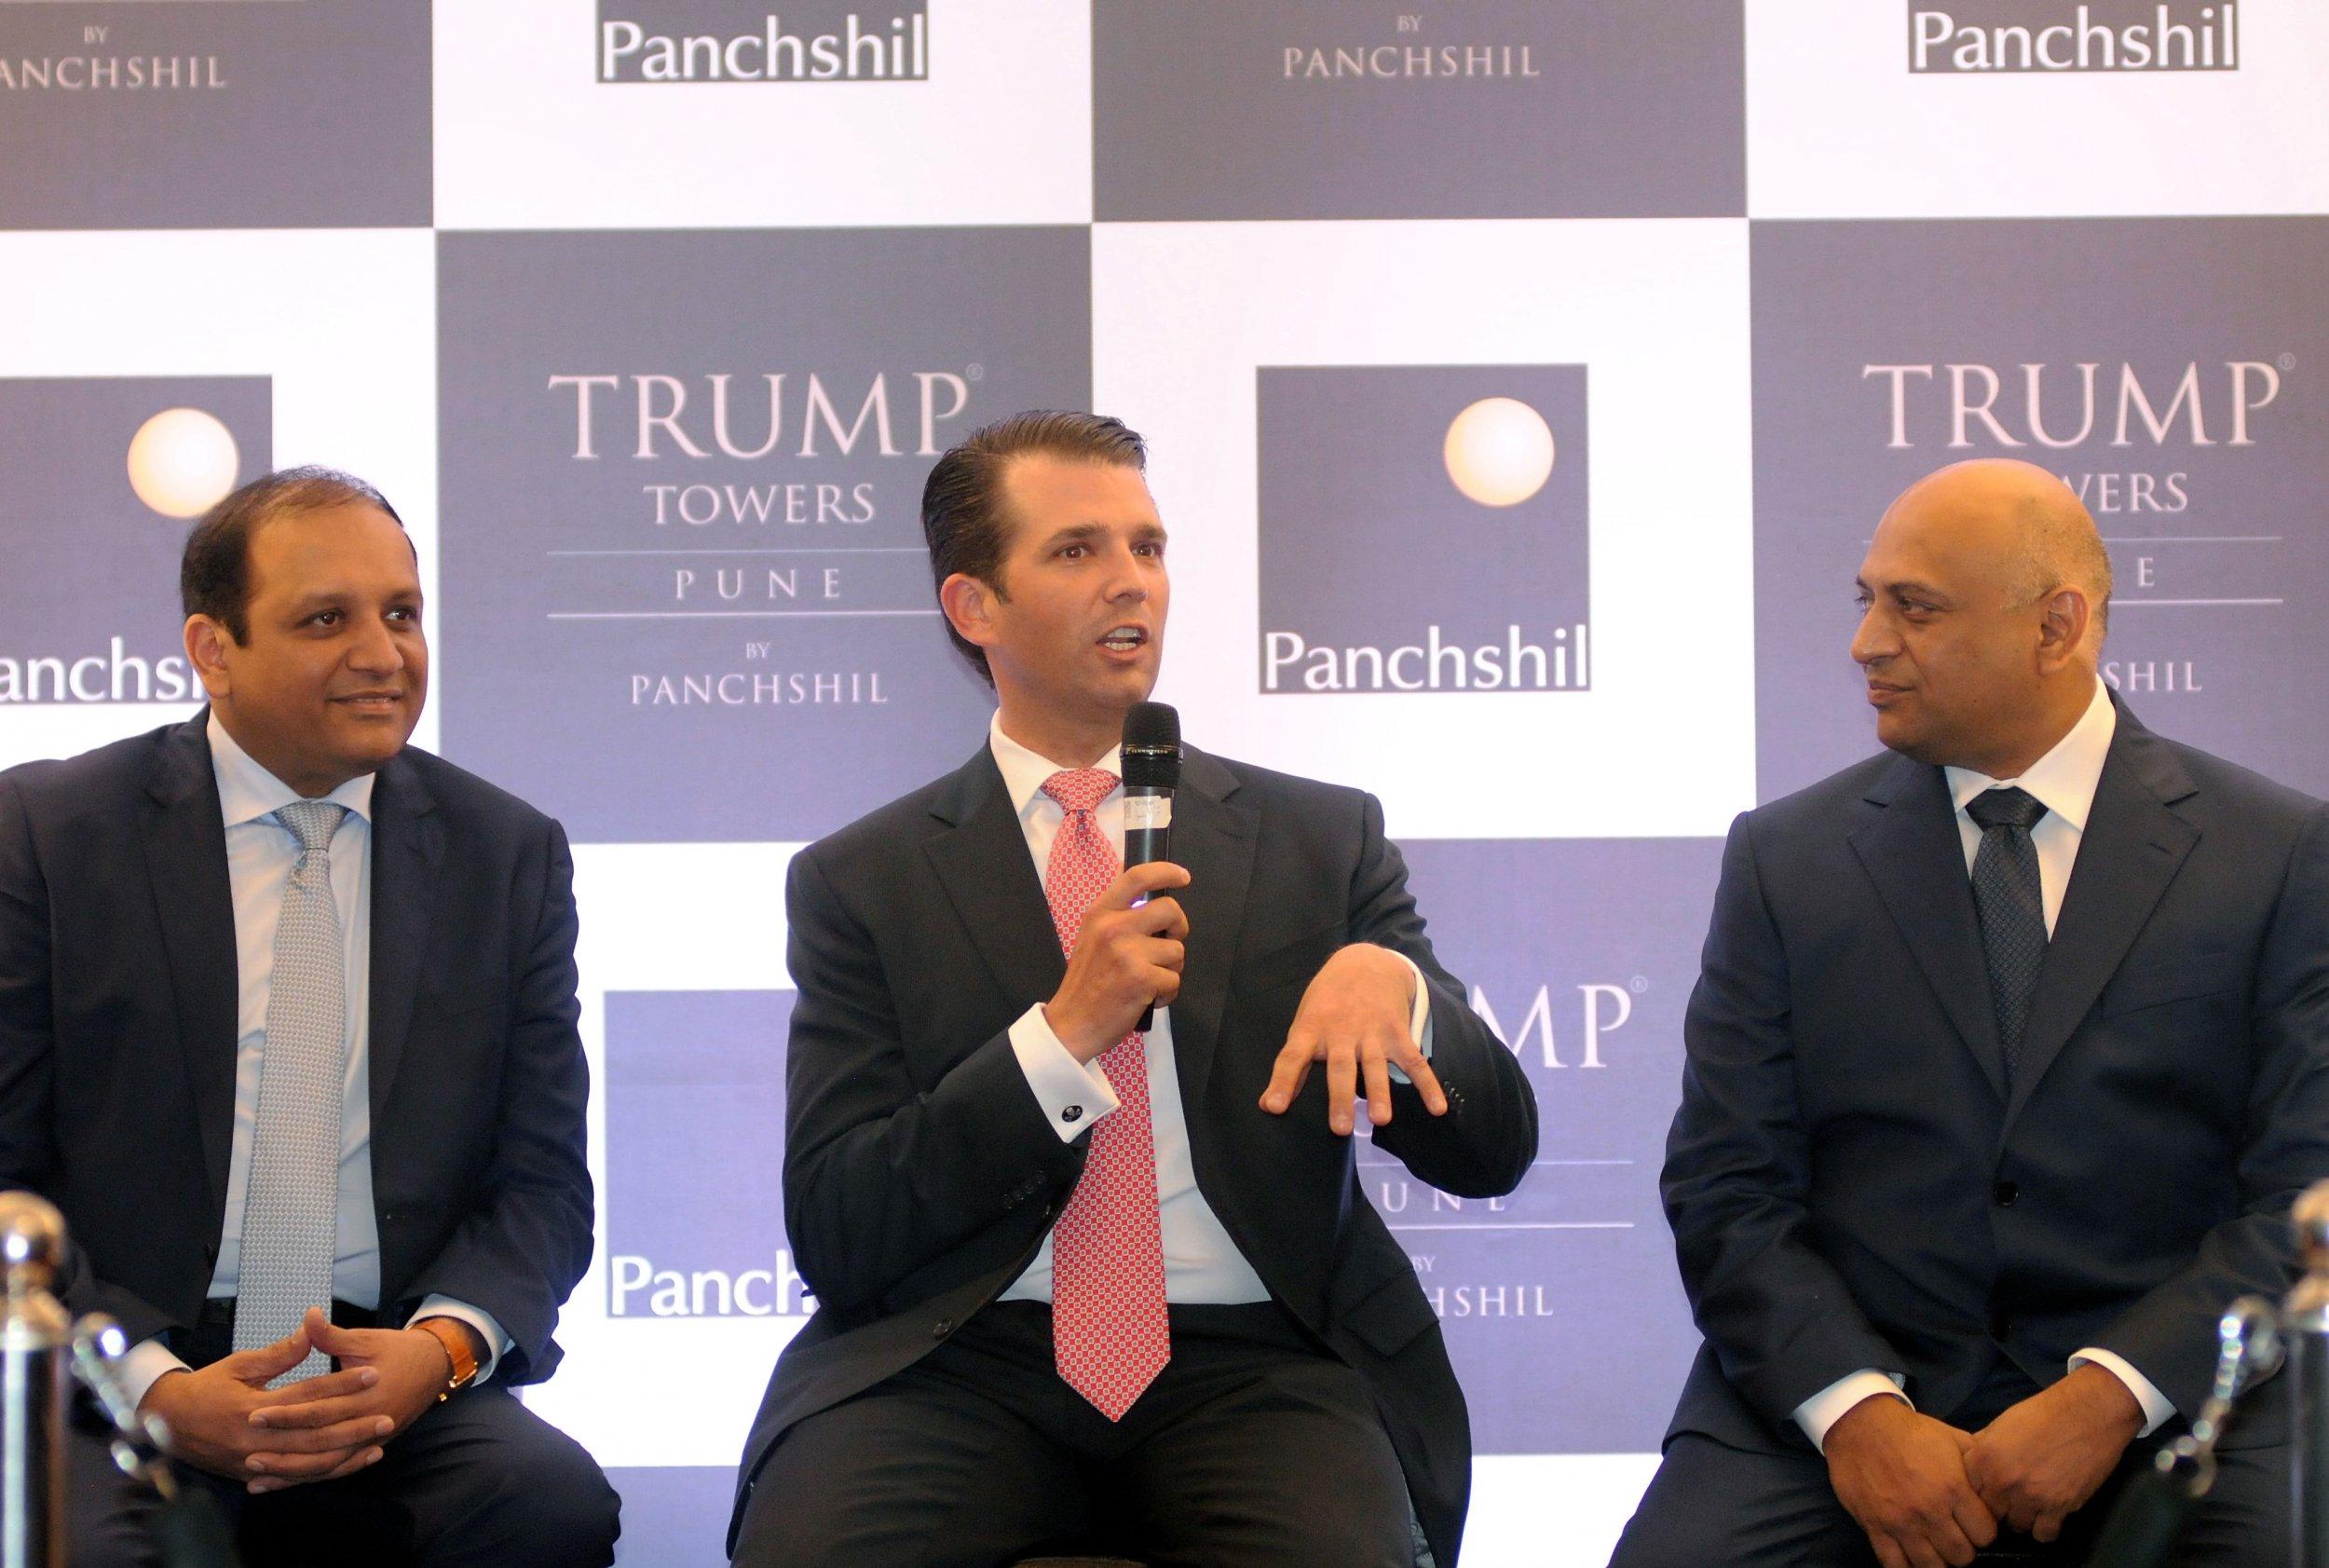 03_19_18_TrumpOrgIndia